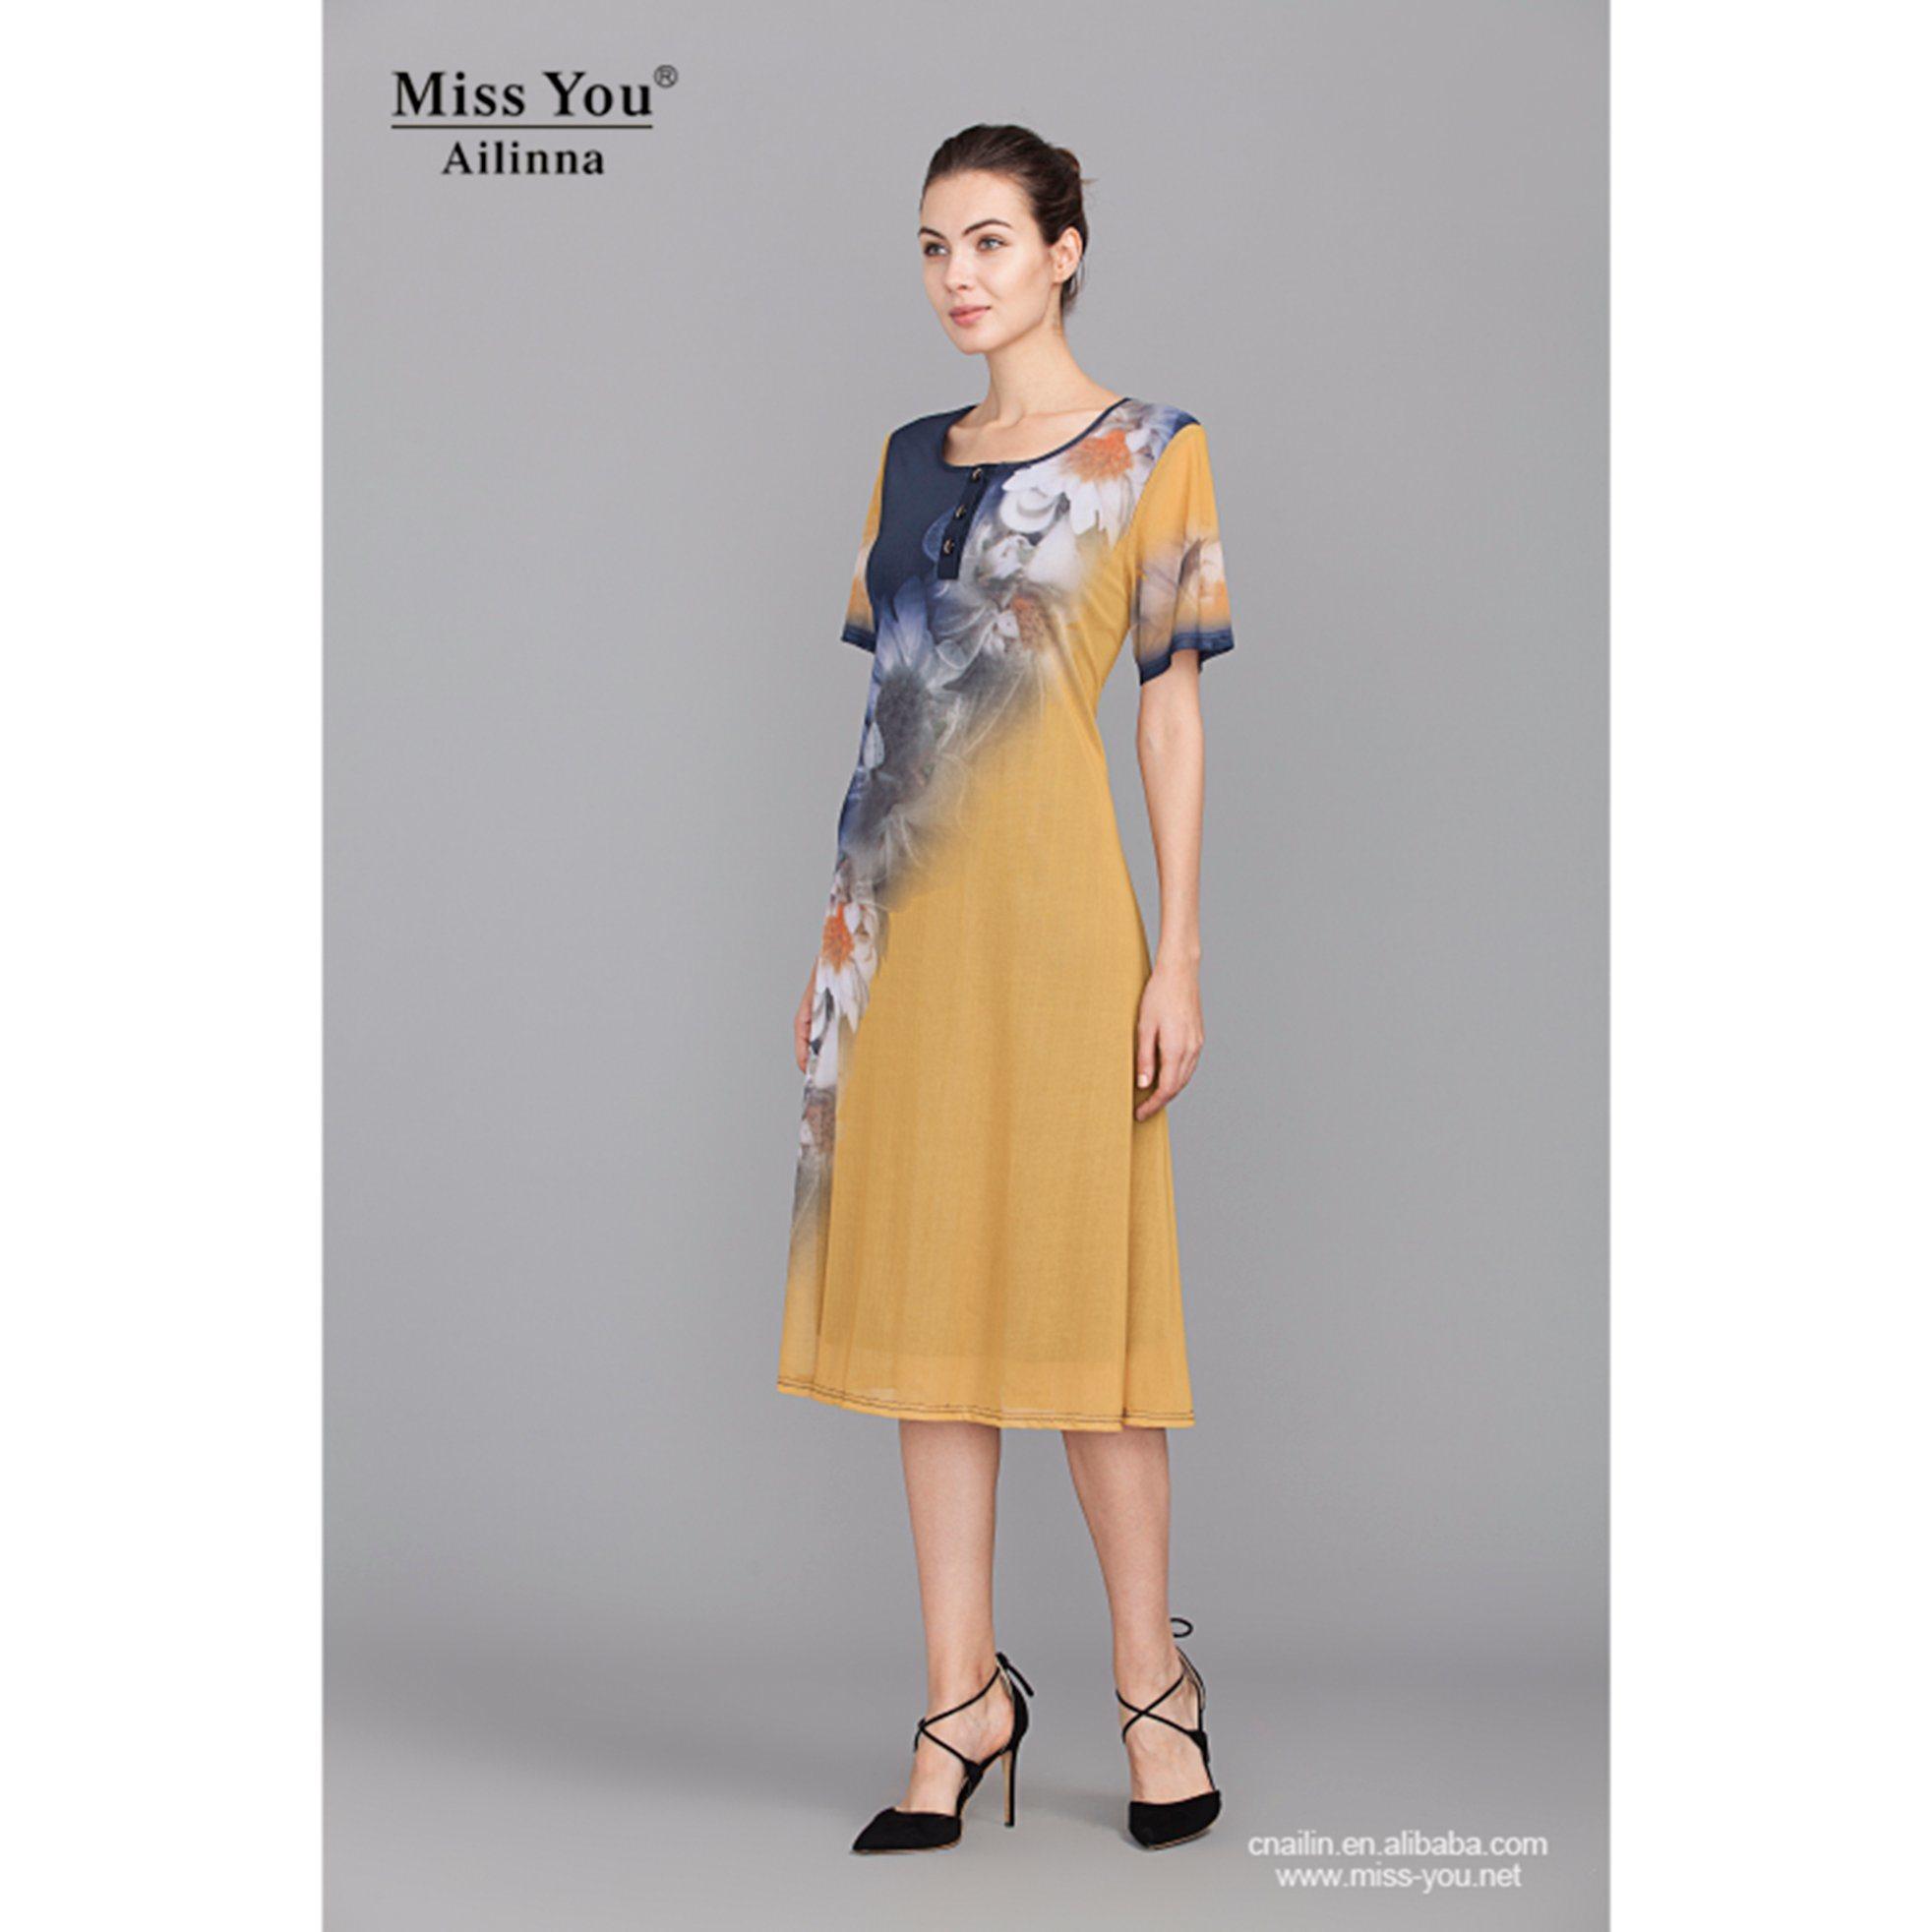 Miss You Ailinna 801829 New Design Women Cool Light Dress with Lining